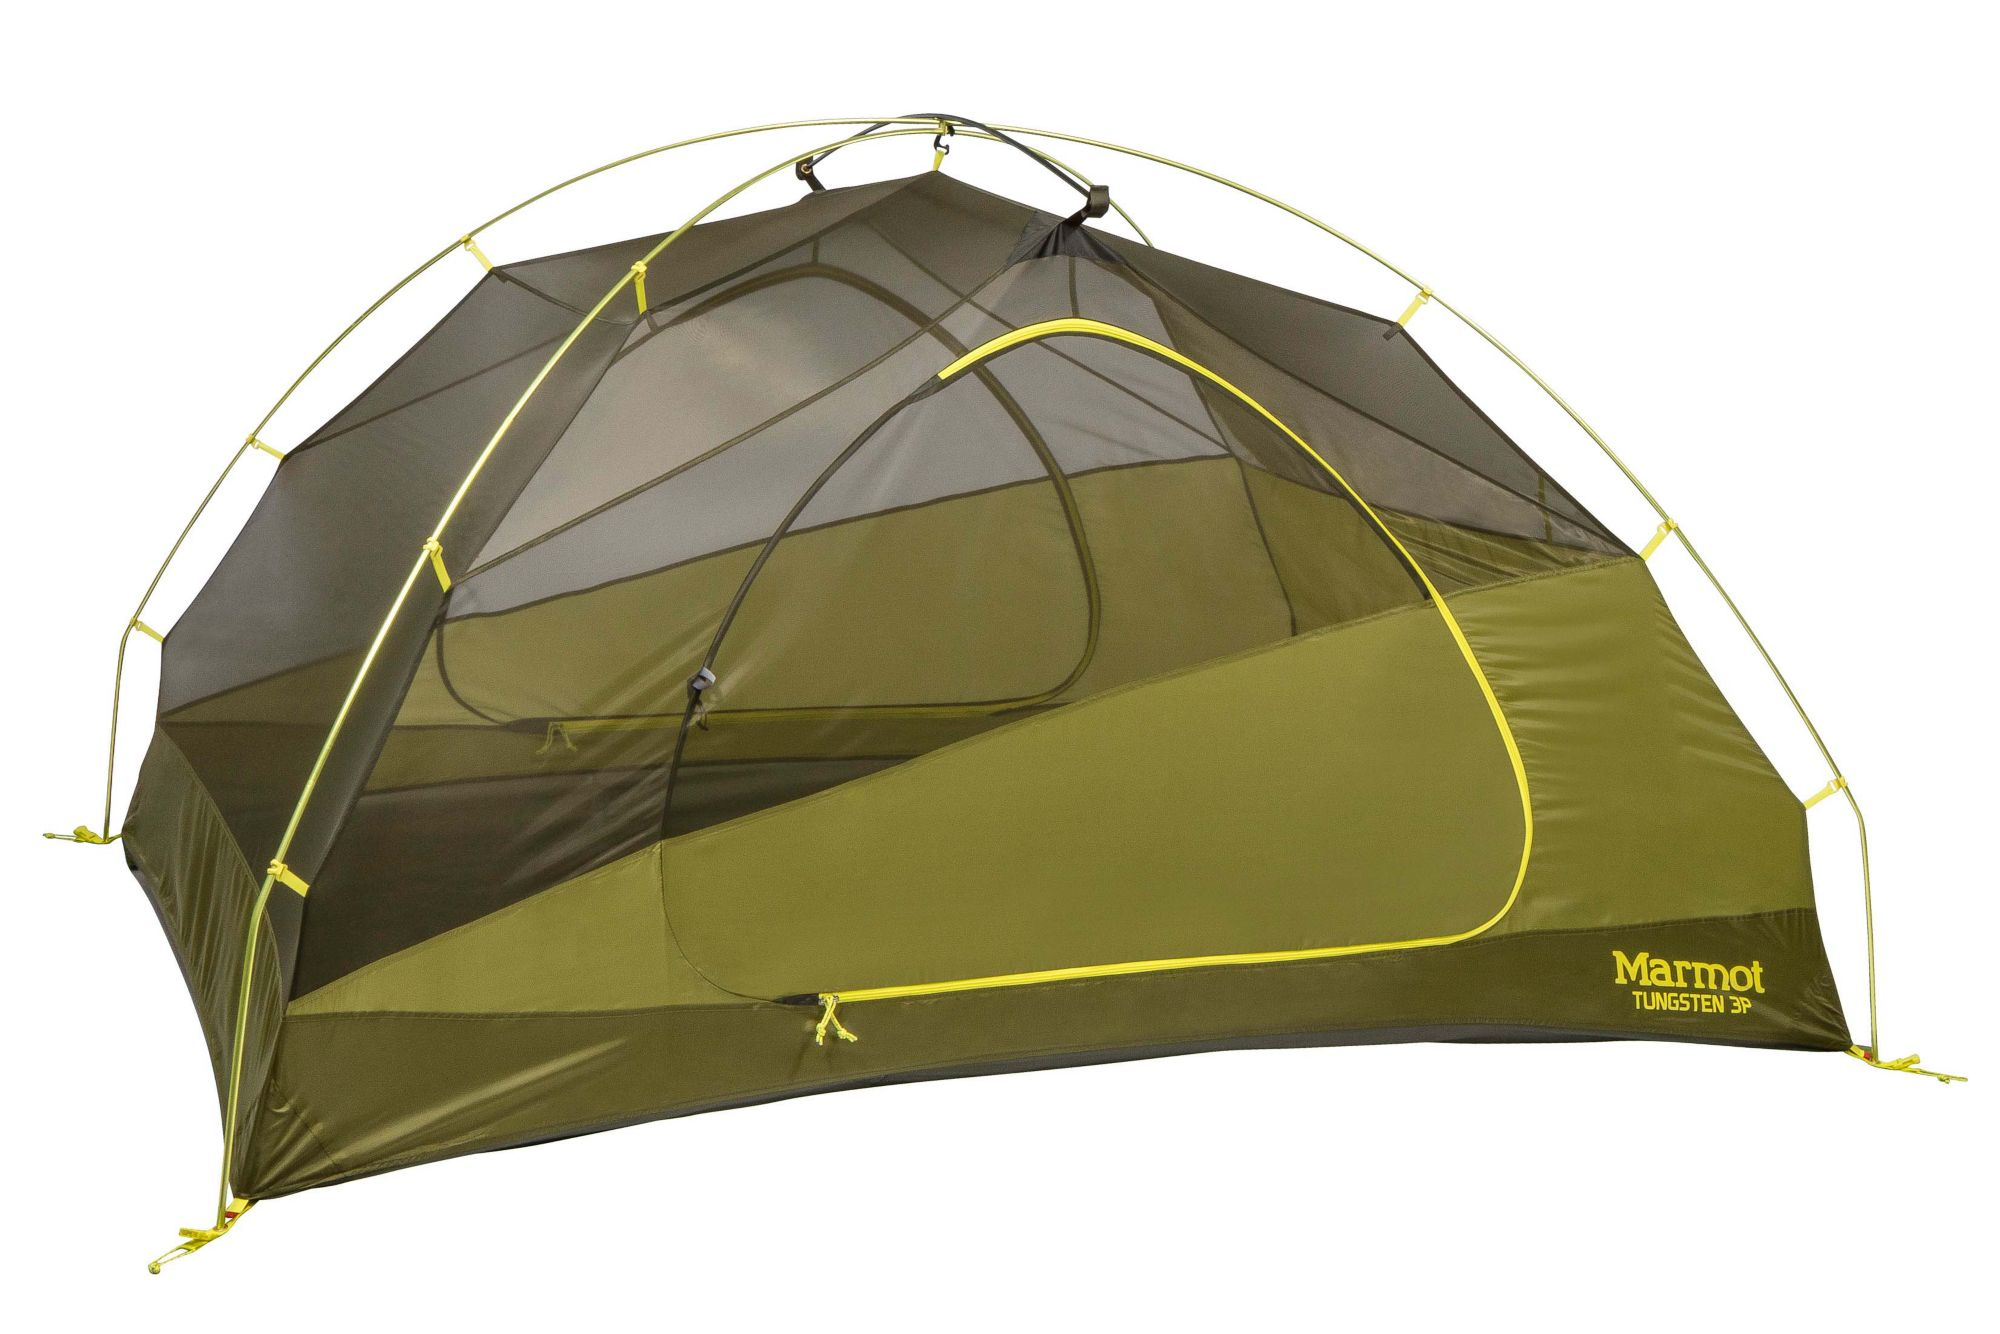 Tungsten 3-Person Tent Green Shadow/Moss medium  sc 1 st  Marmot & 3 Person Tents / Tents / Equipment | Marmot.com